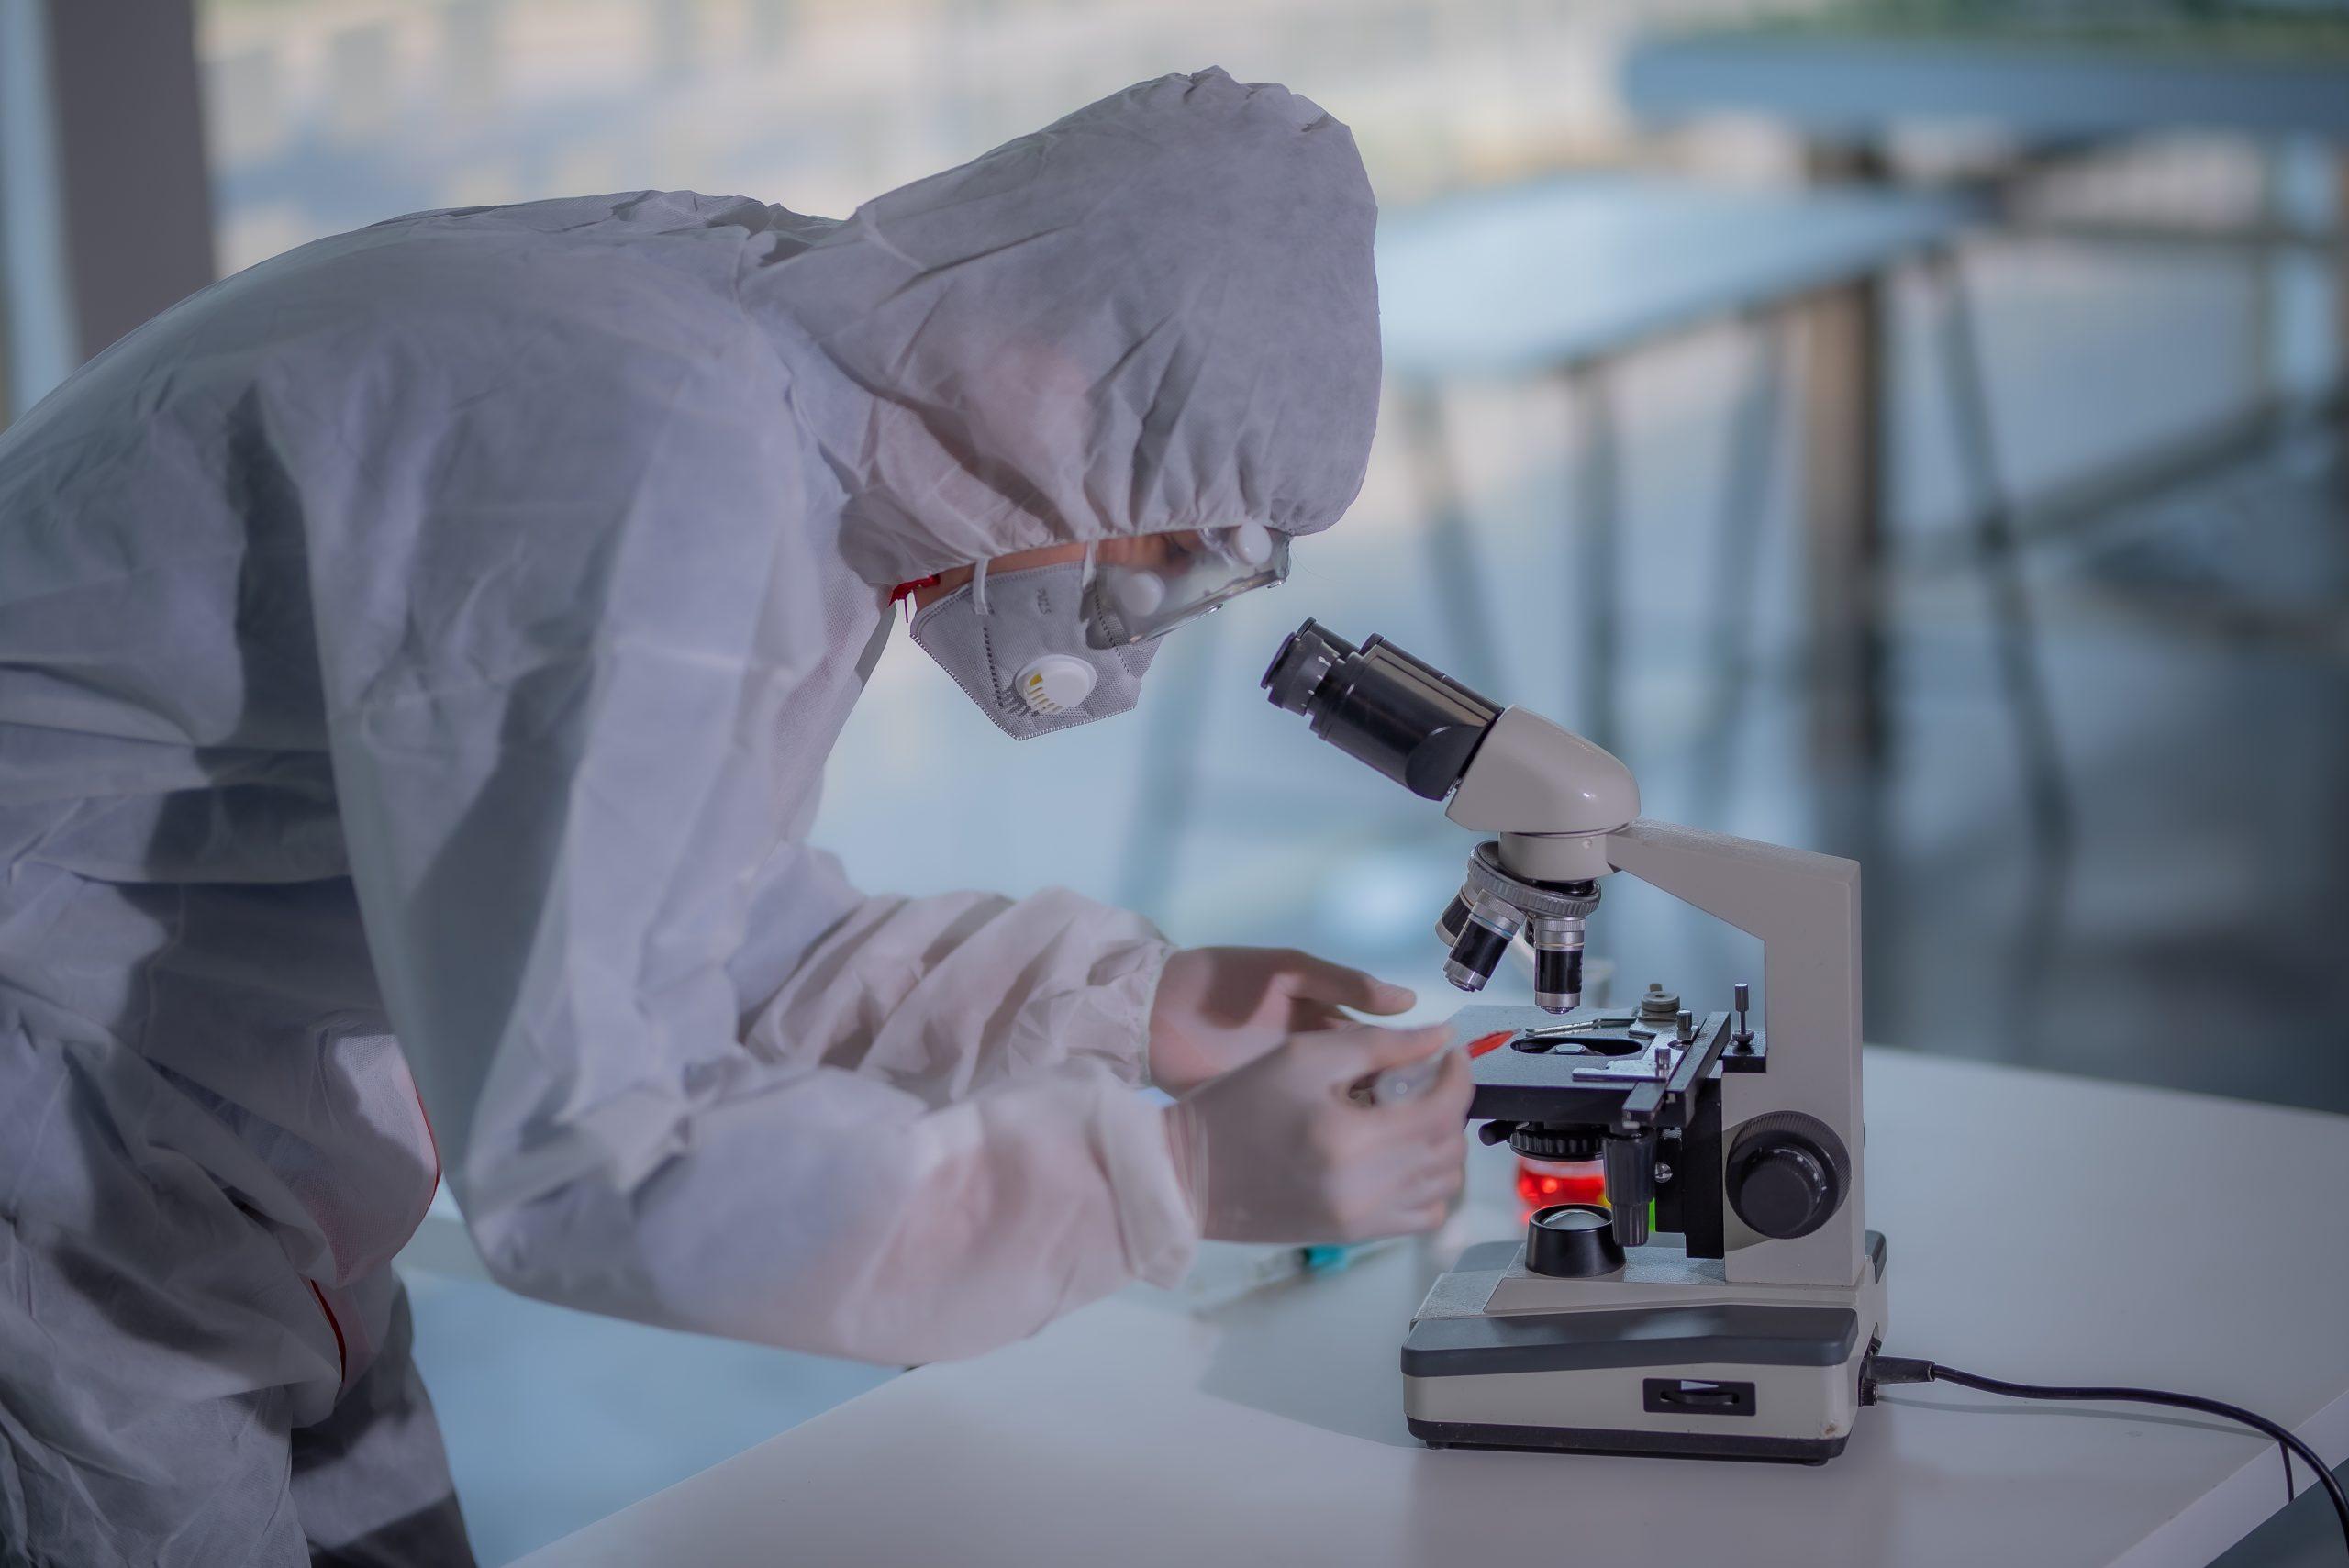 Frontrunners for Australia's COVID-19 vaccine